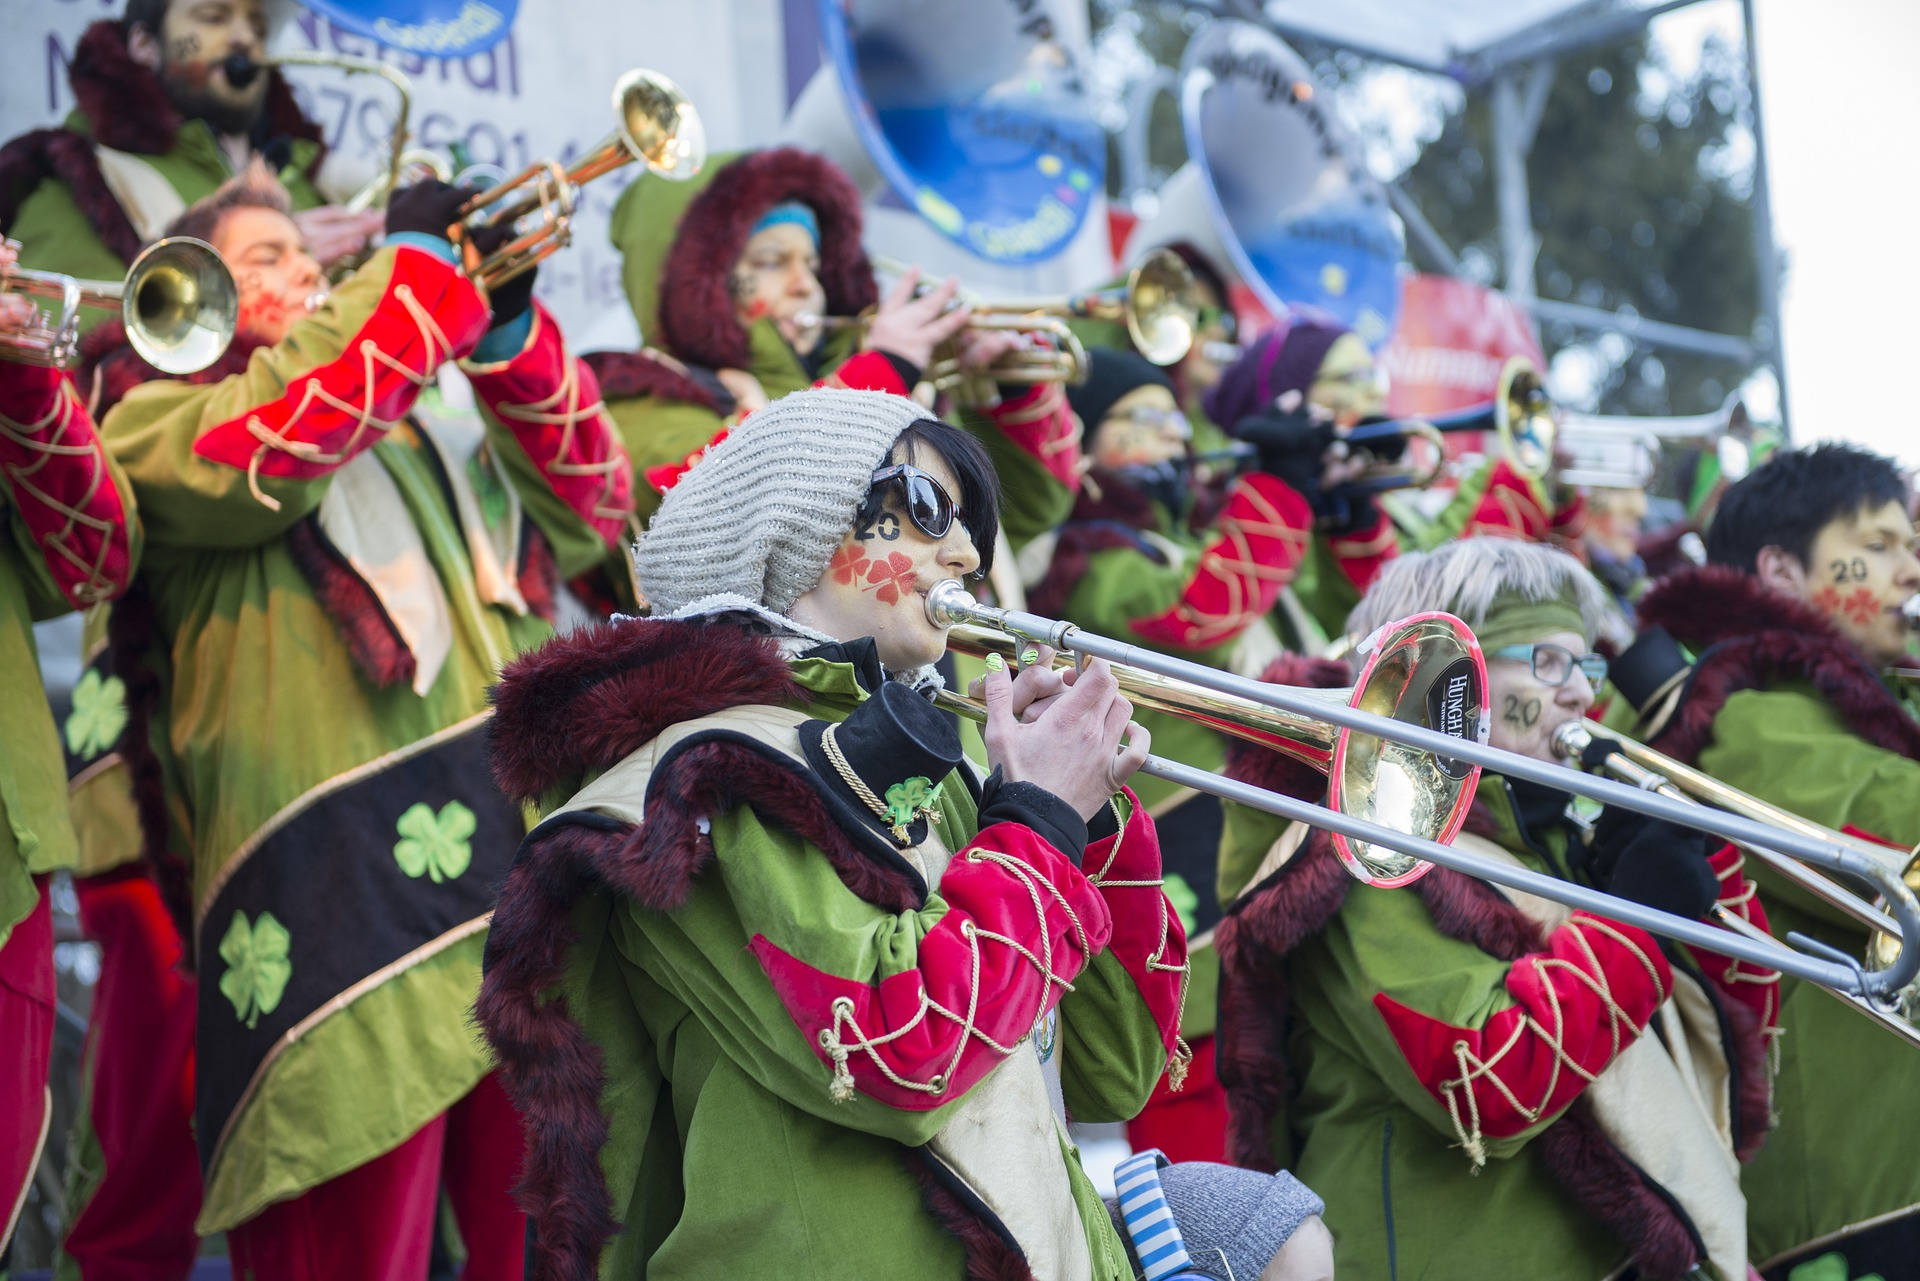 posaune-ehrenfelder-musikschule-köln mann karneval frau brille